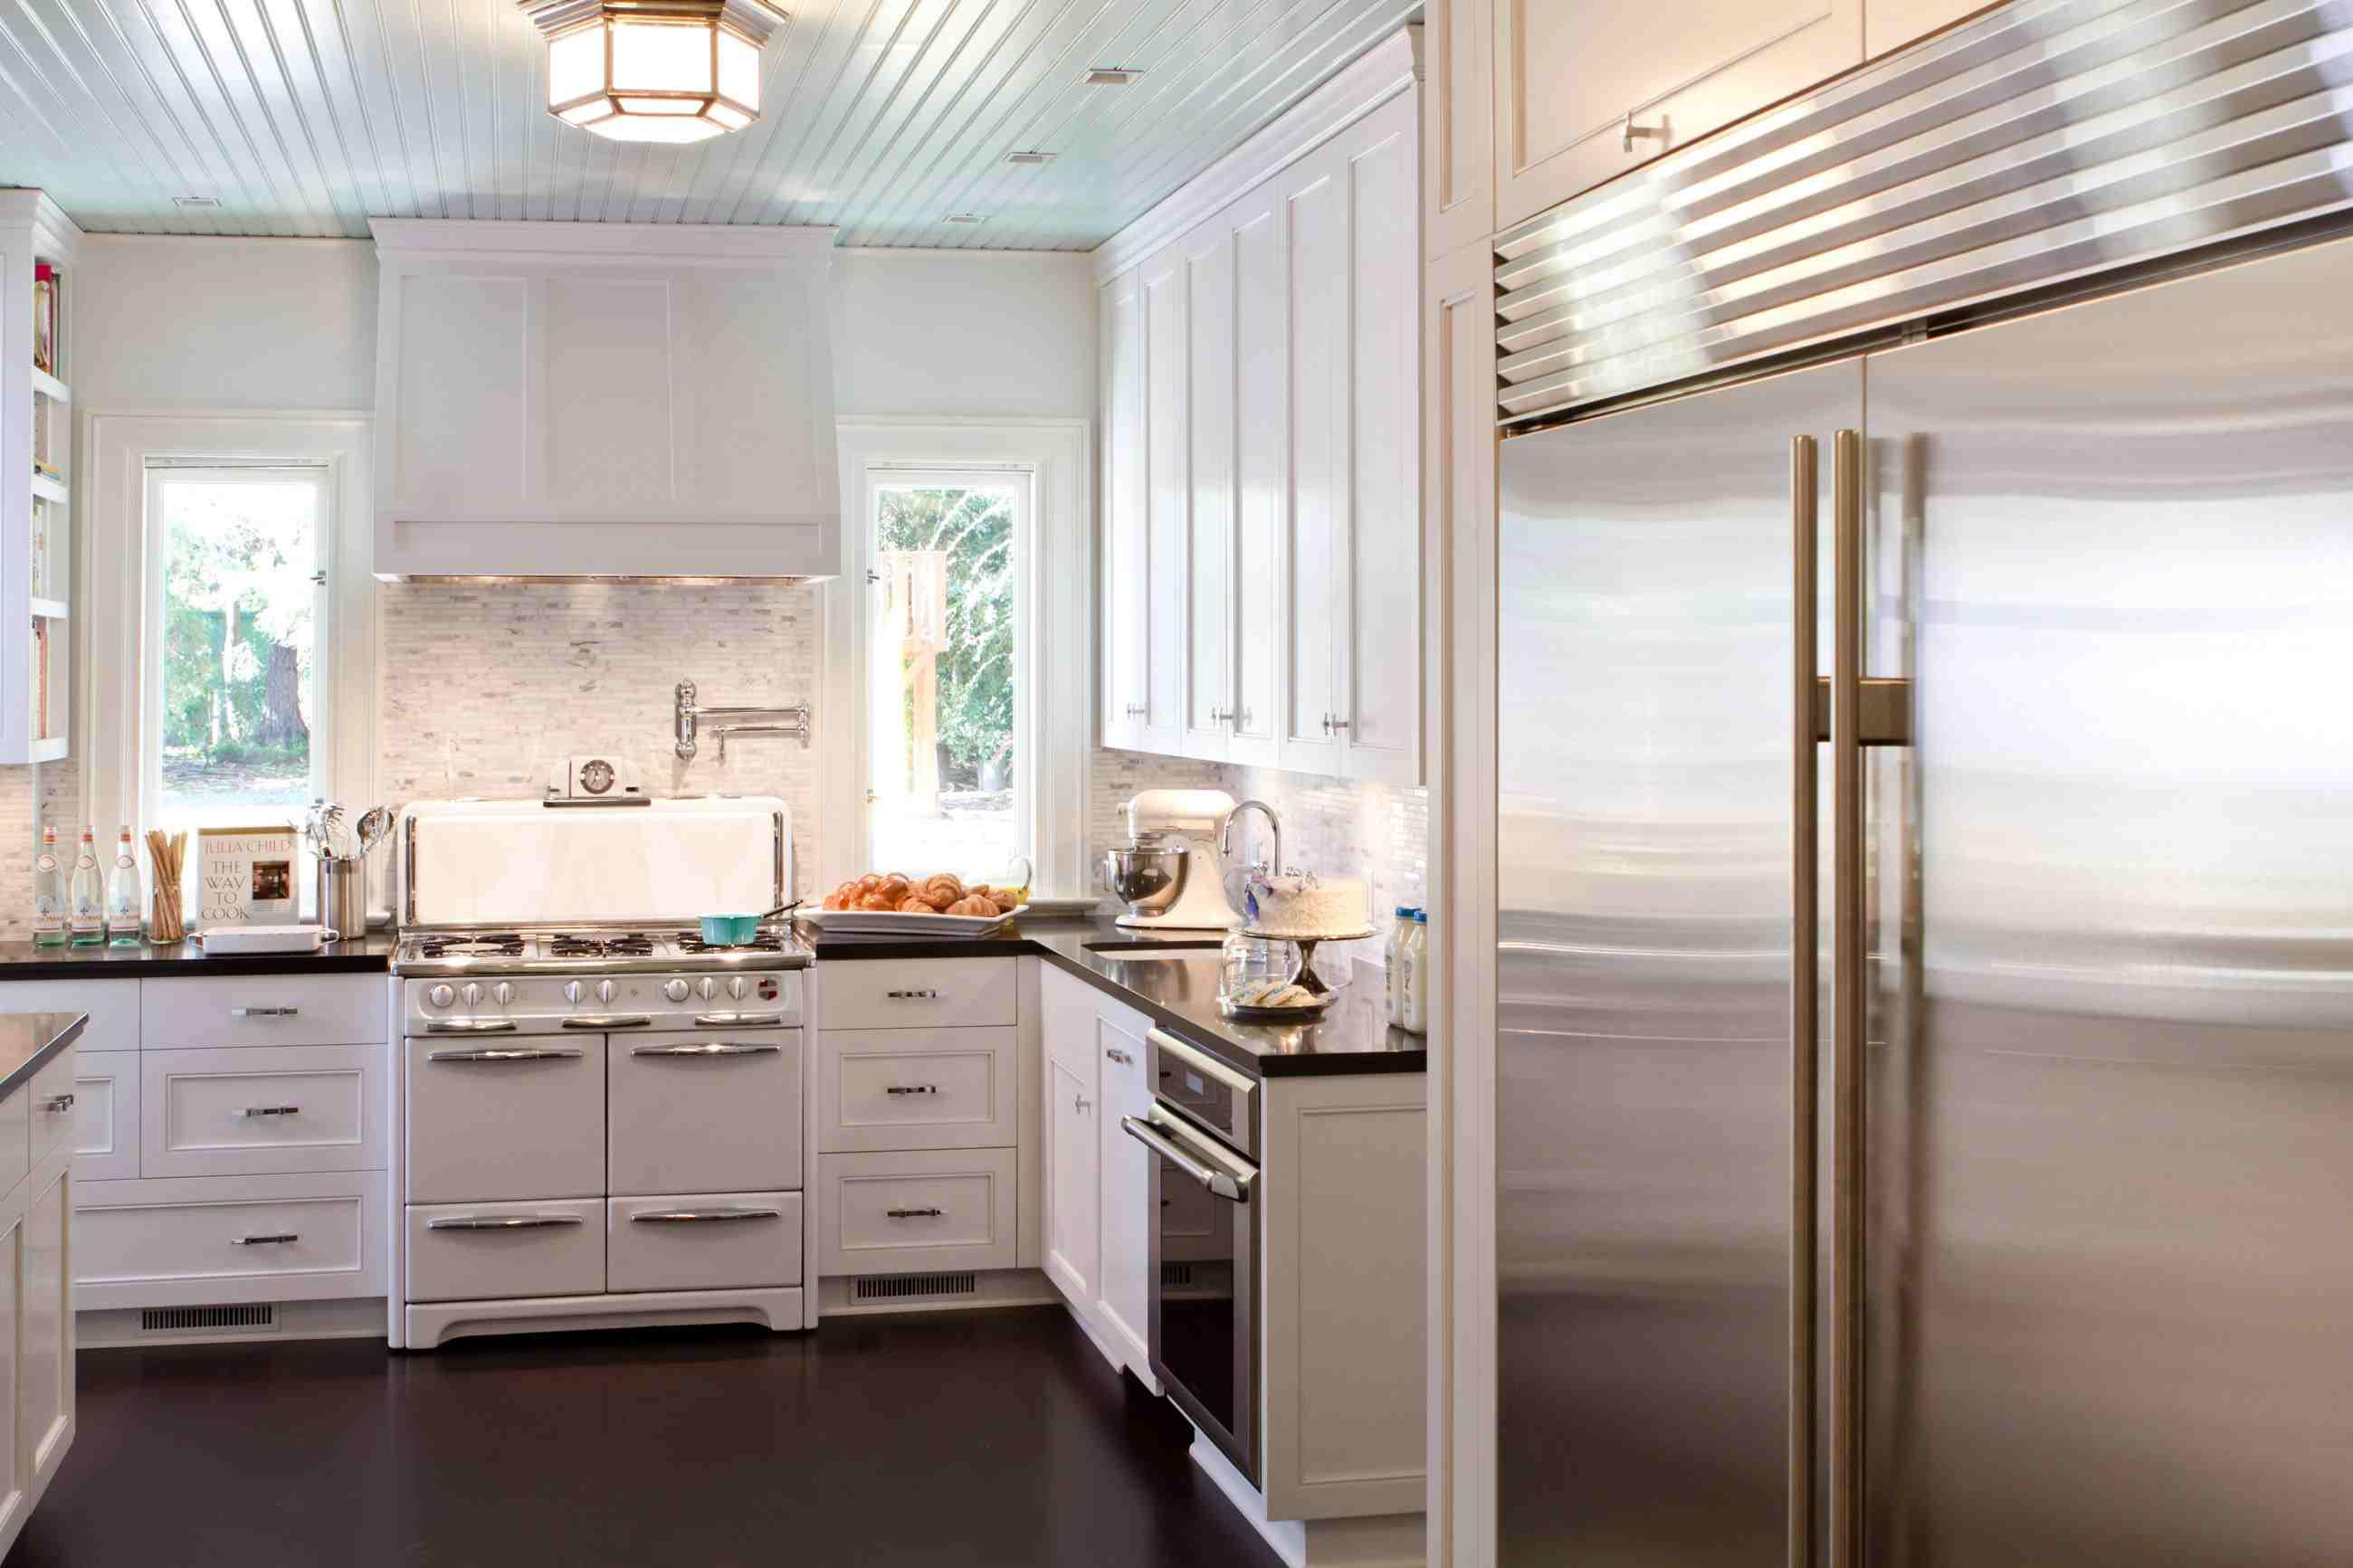 pale blue ceiling in white retro kitchen